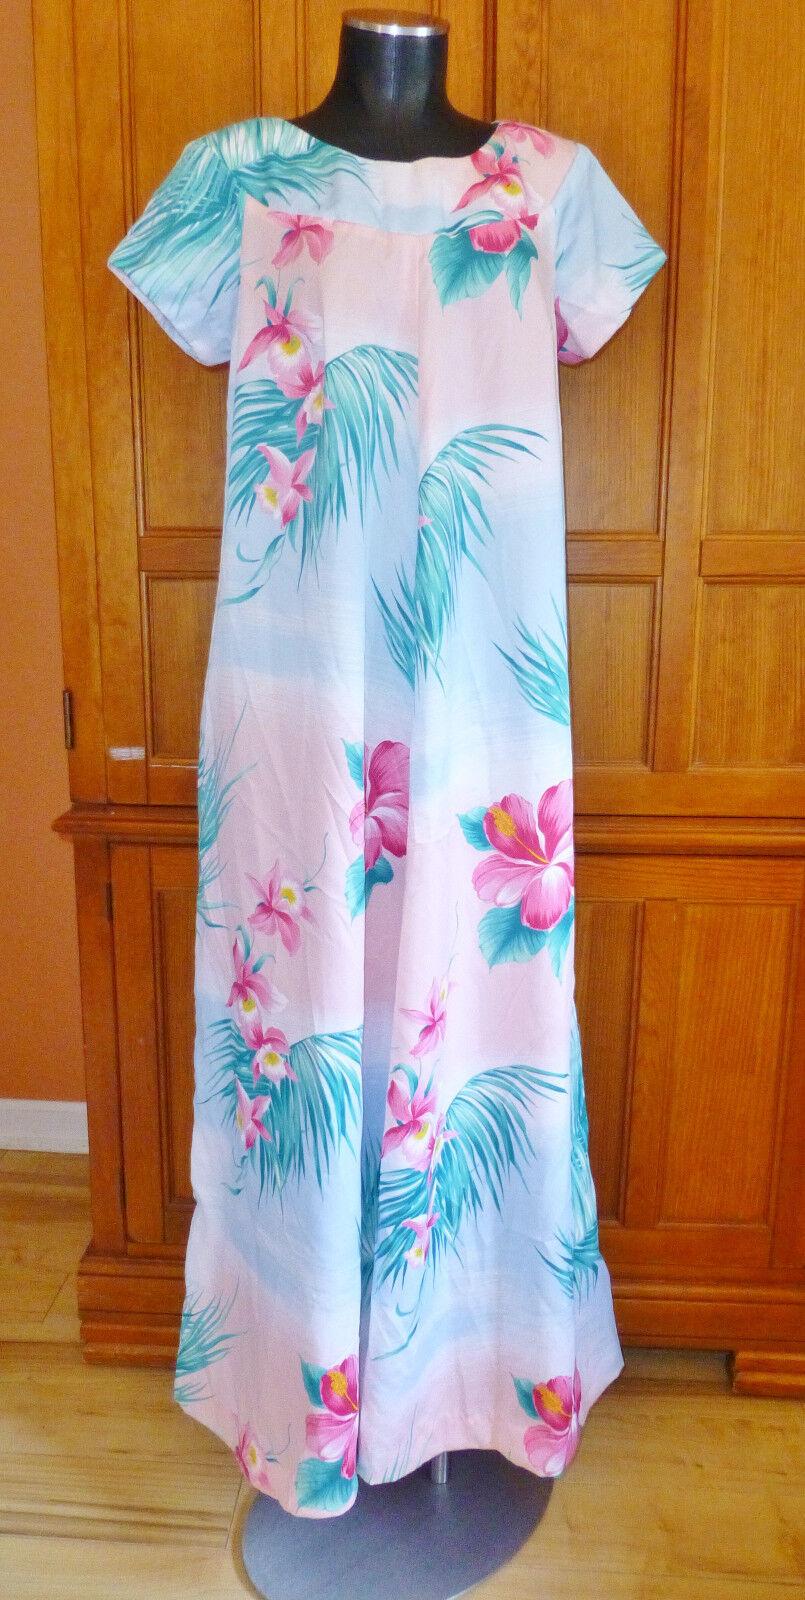 c8202b7557561 VTG HAWAIIAN Pastel Floral Tropical Print Polynesian Party DRESS ...